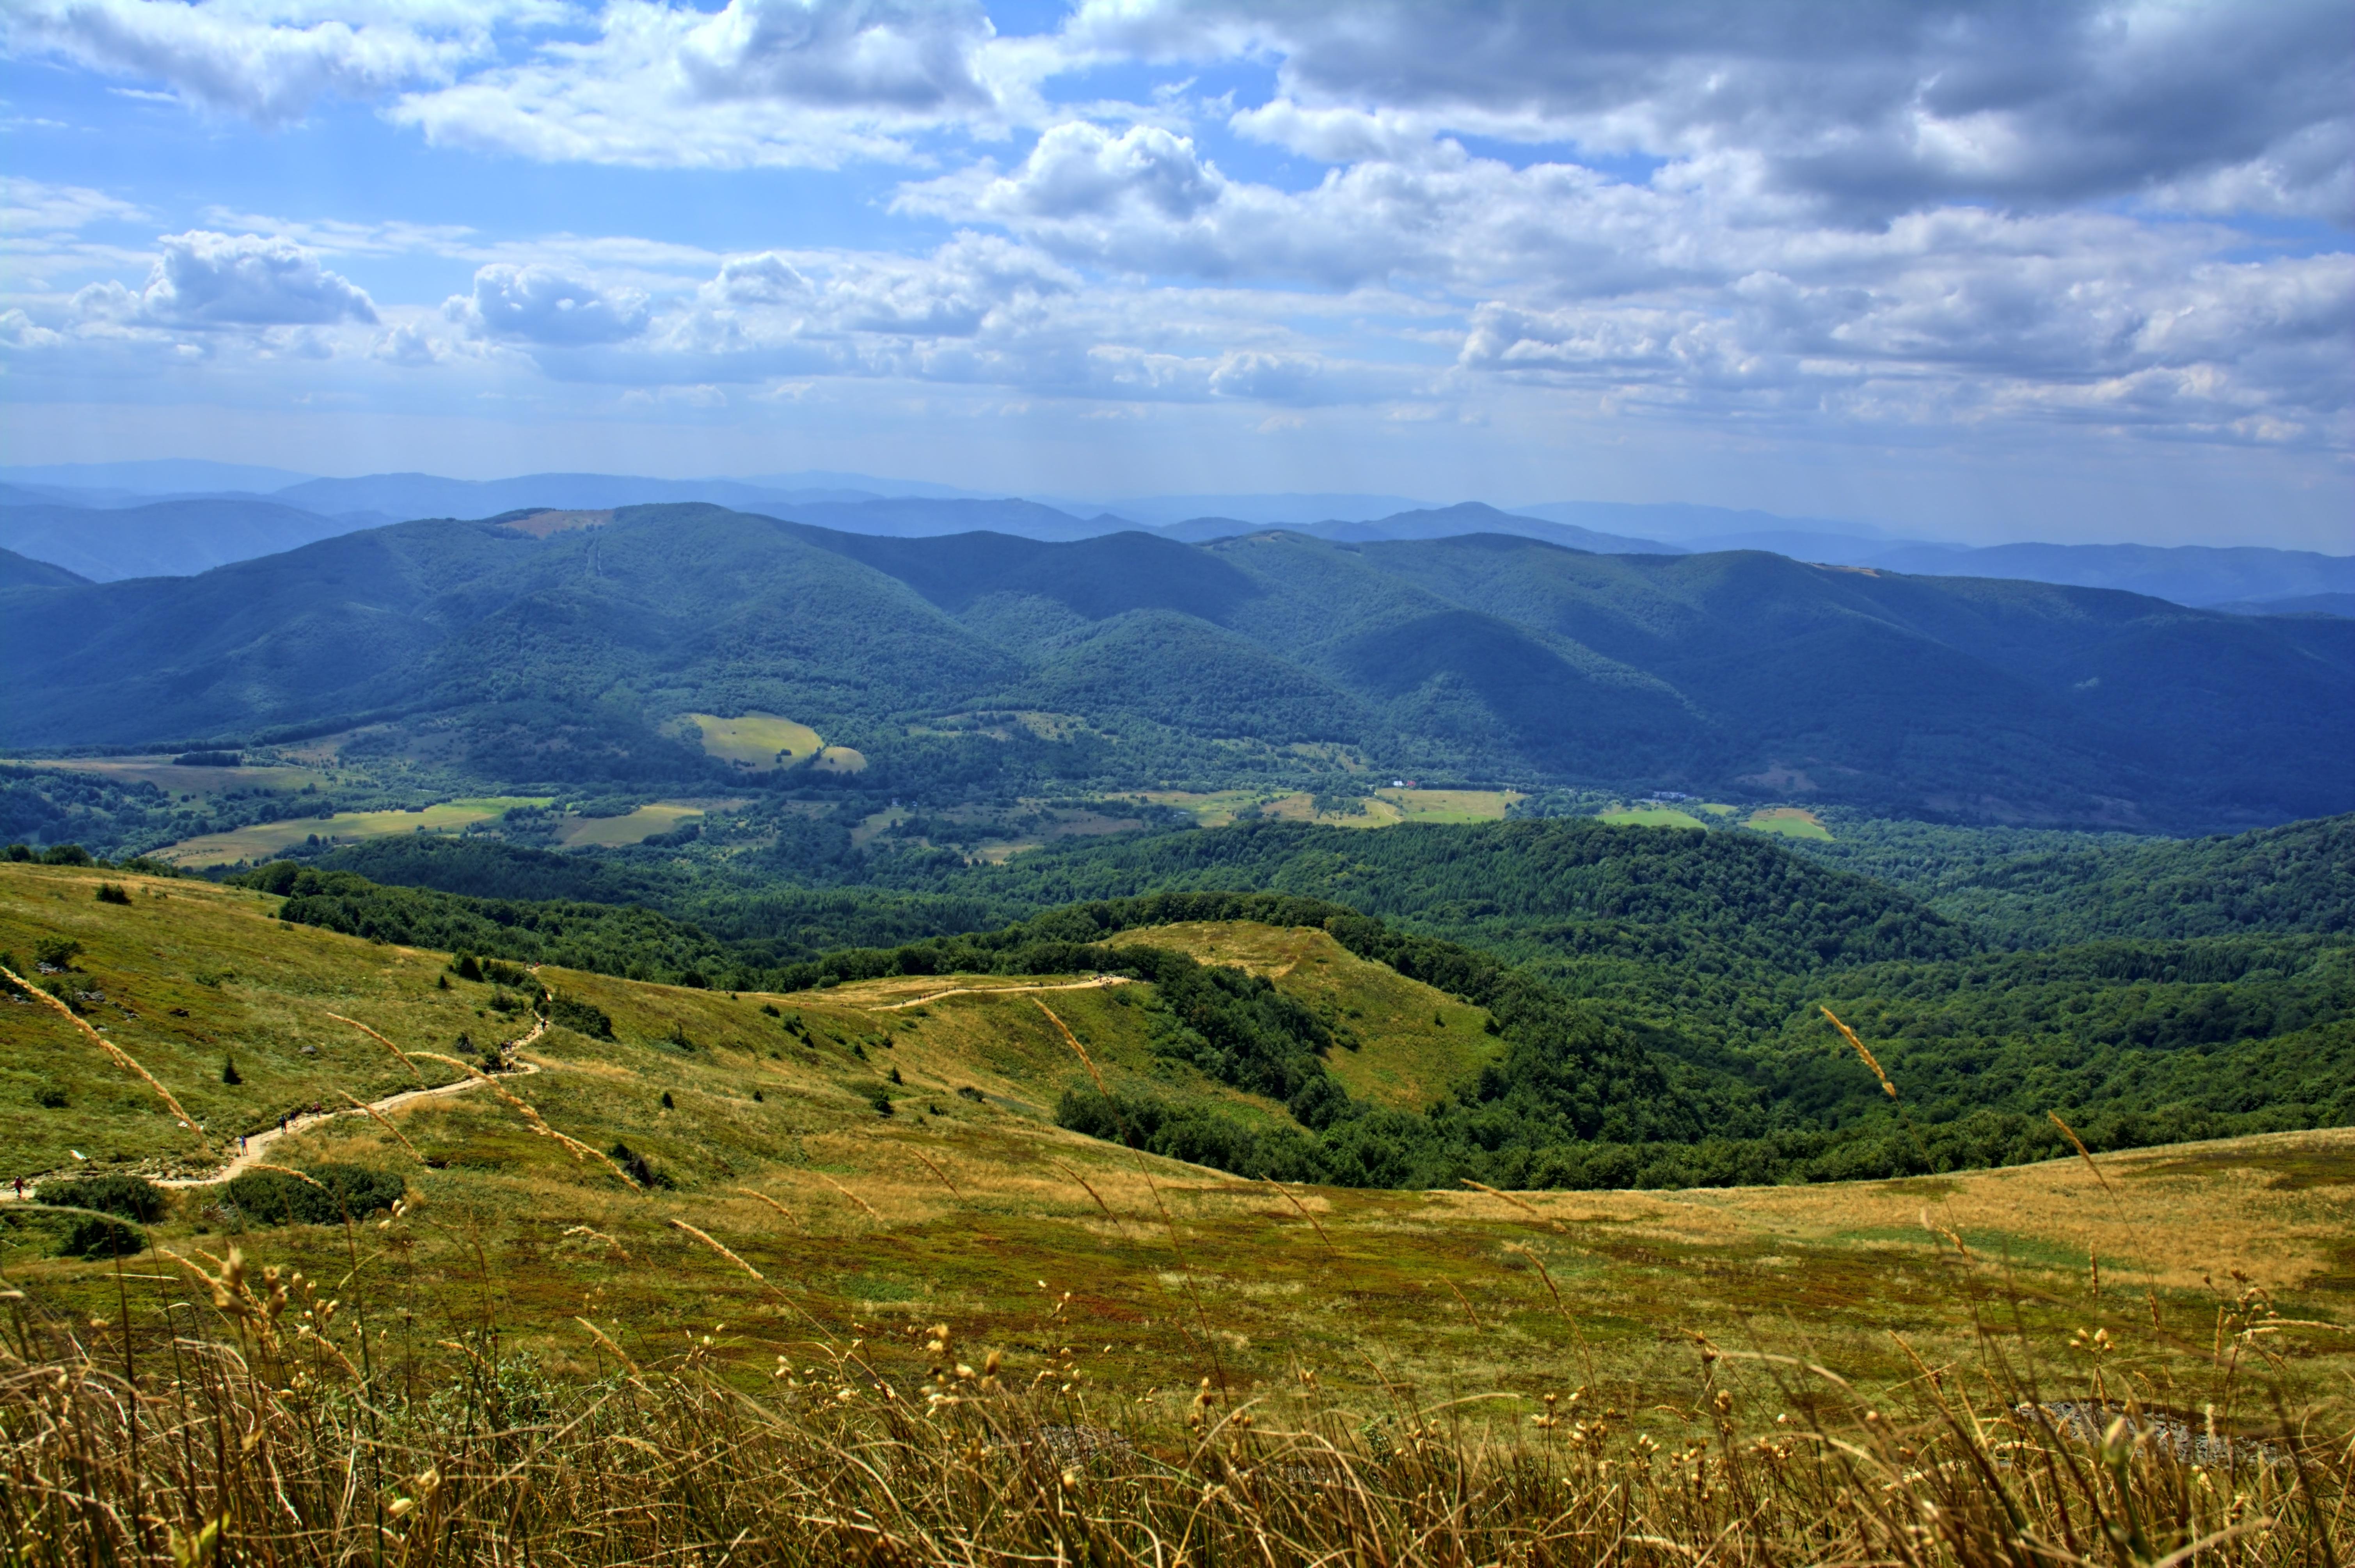 Free Images : landscape, nature, grass, wilderness, cloud ... | 6036 x 4020 jpeg 5204kB